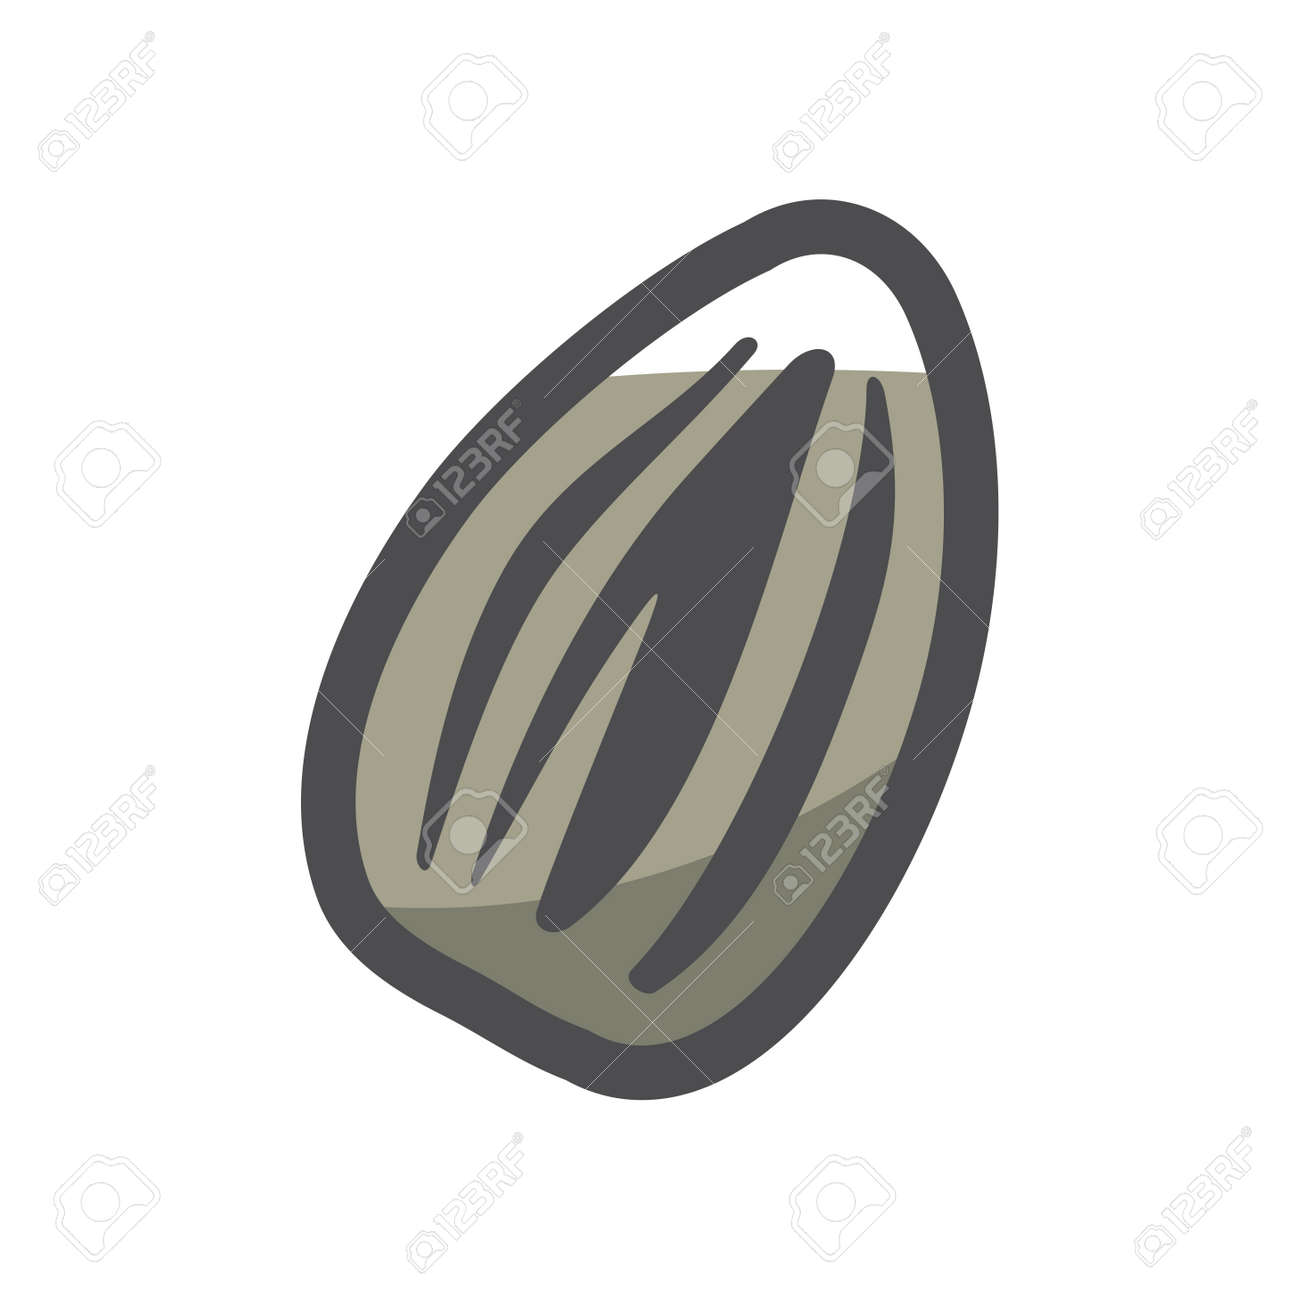 Sunflower Seed simple Vector icon Cartoon illustration. - 169912853